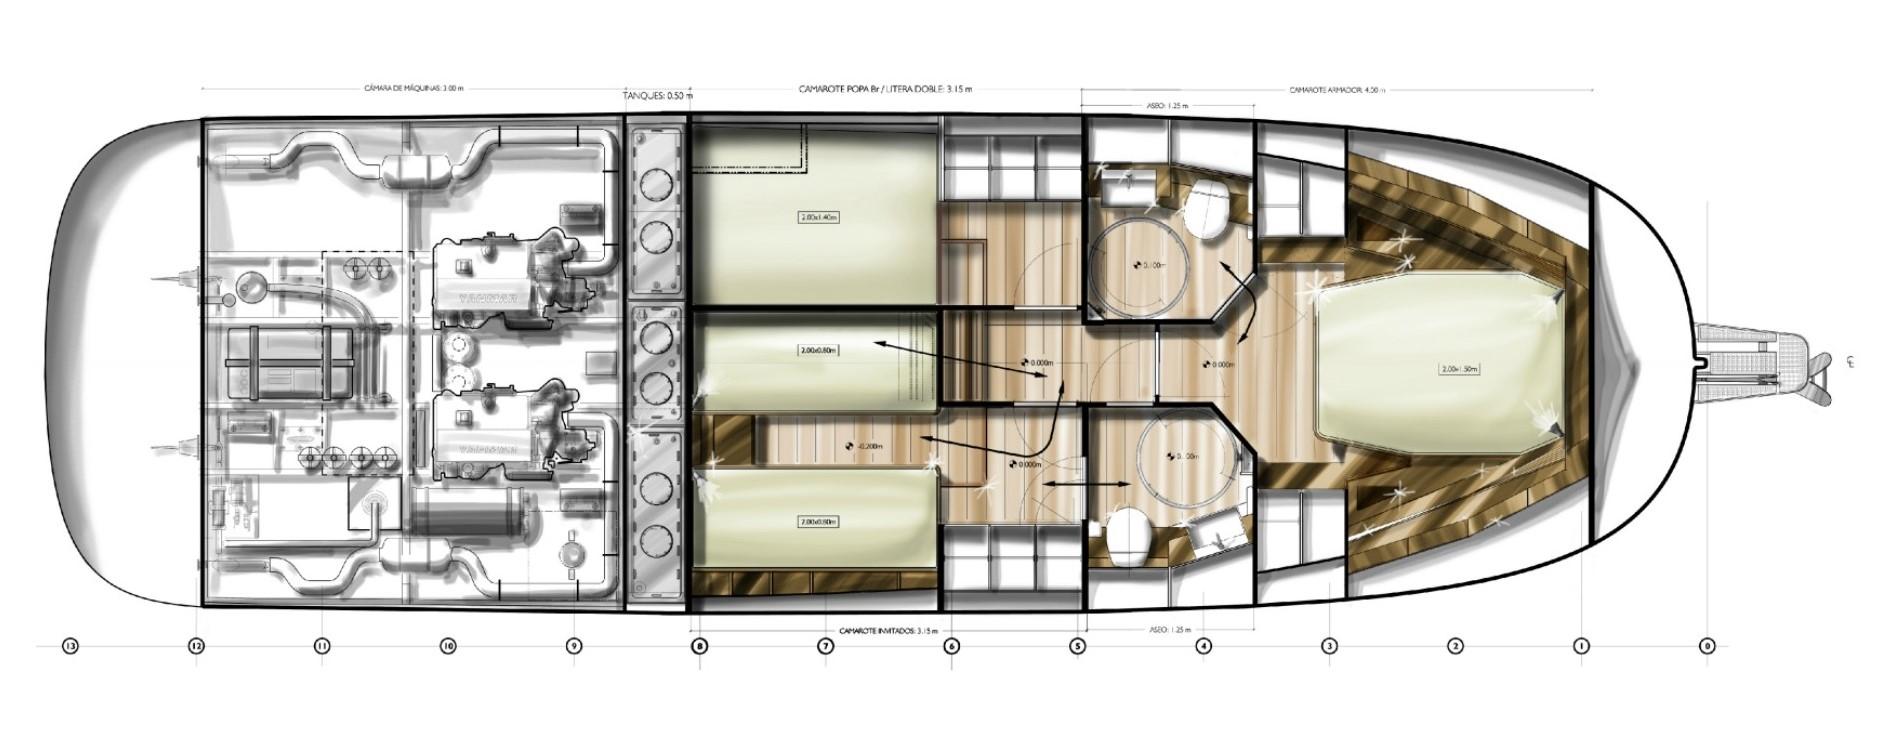 minorca islander 42 hardtop layout lower deck with 3 cabin option